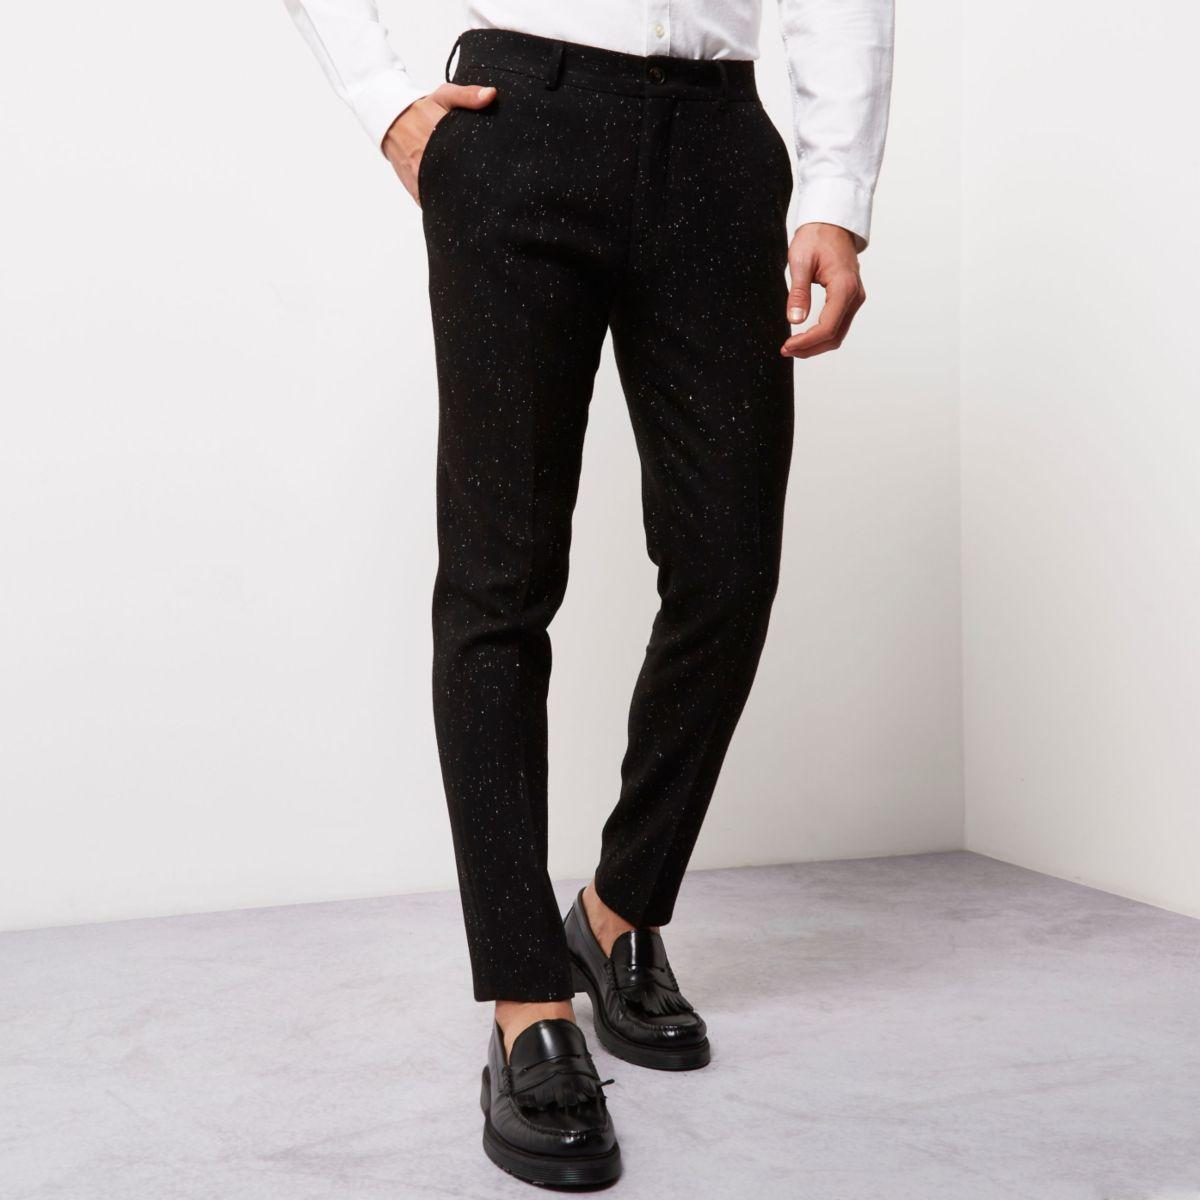 Black flecked skinny fit pants